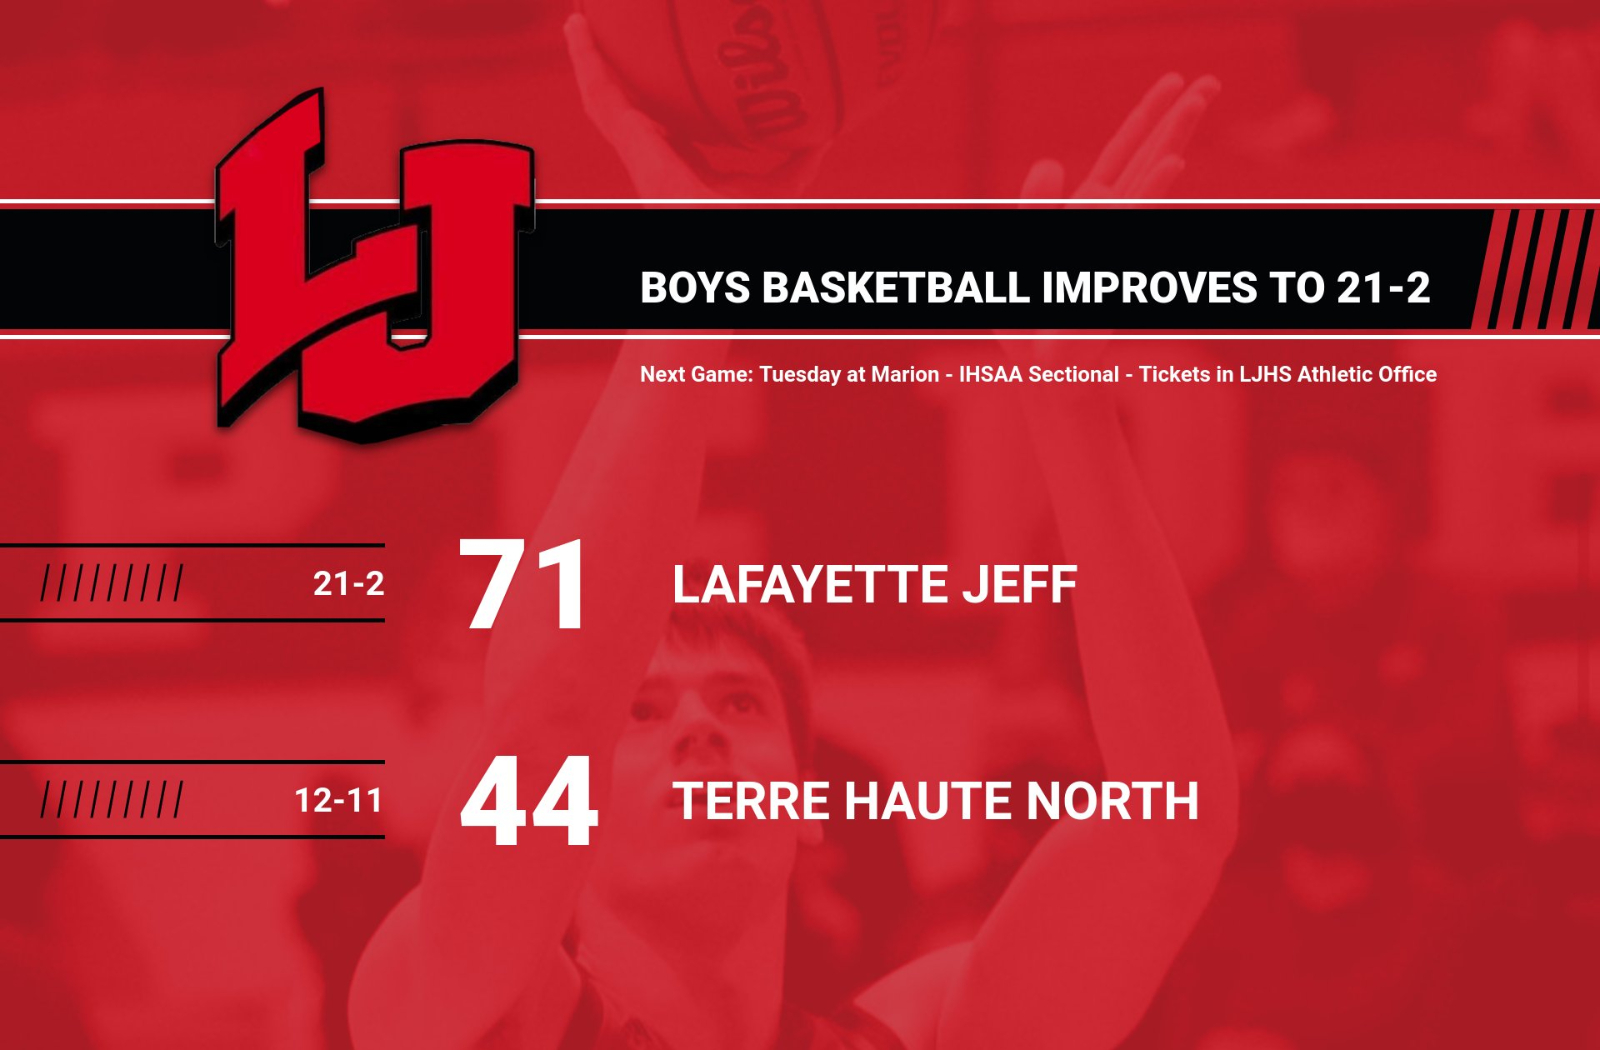 Boys Basketball Improves to 21-2